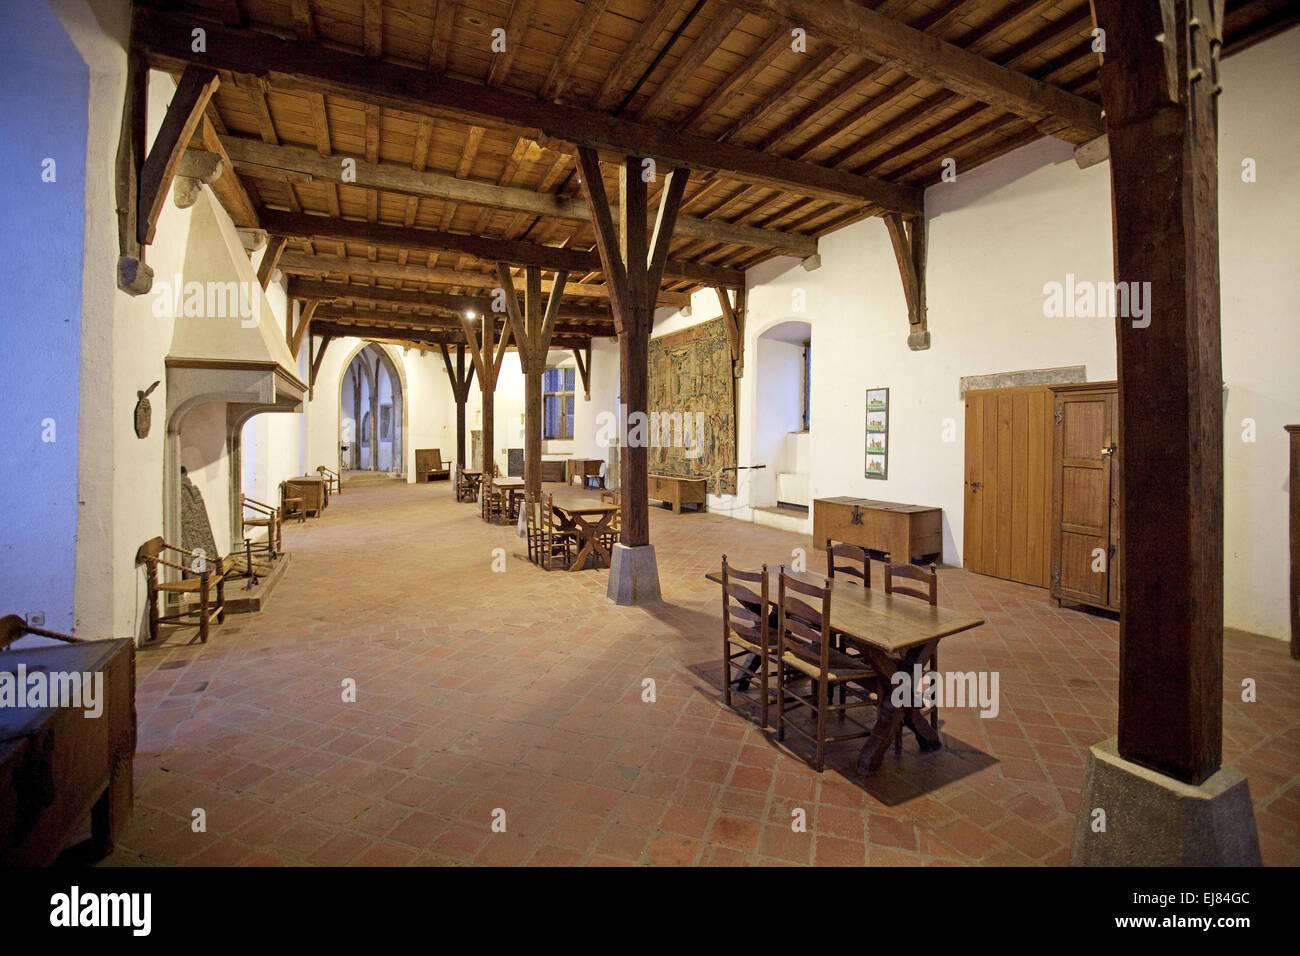 Castle Museum Linn, Krefeld, Germany - Stock Image